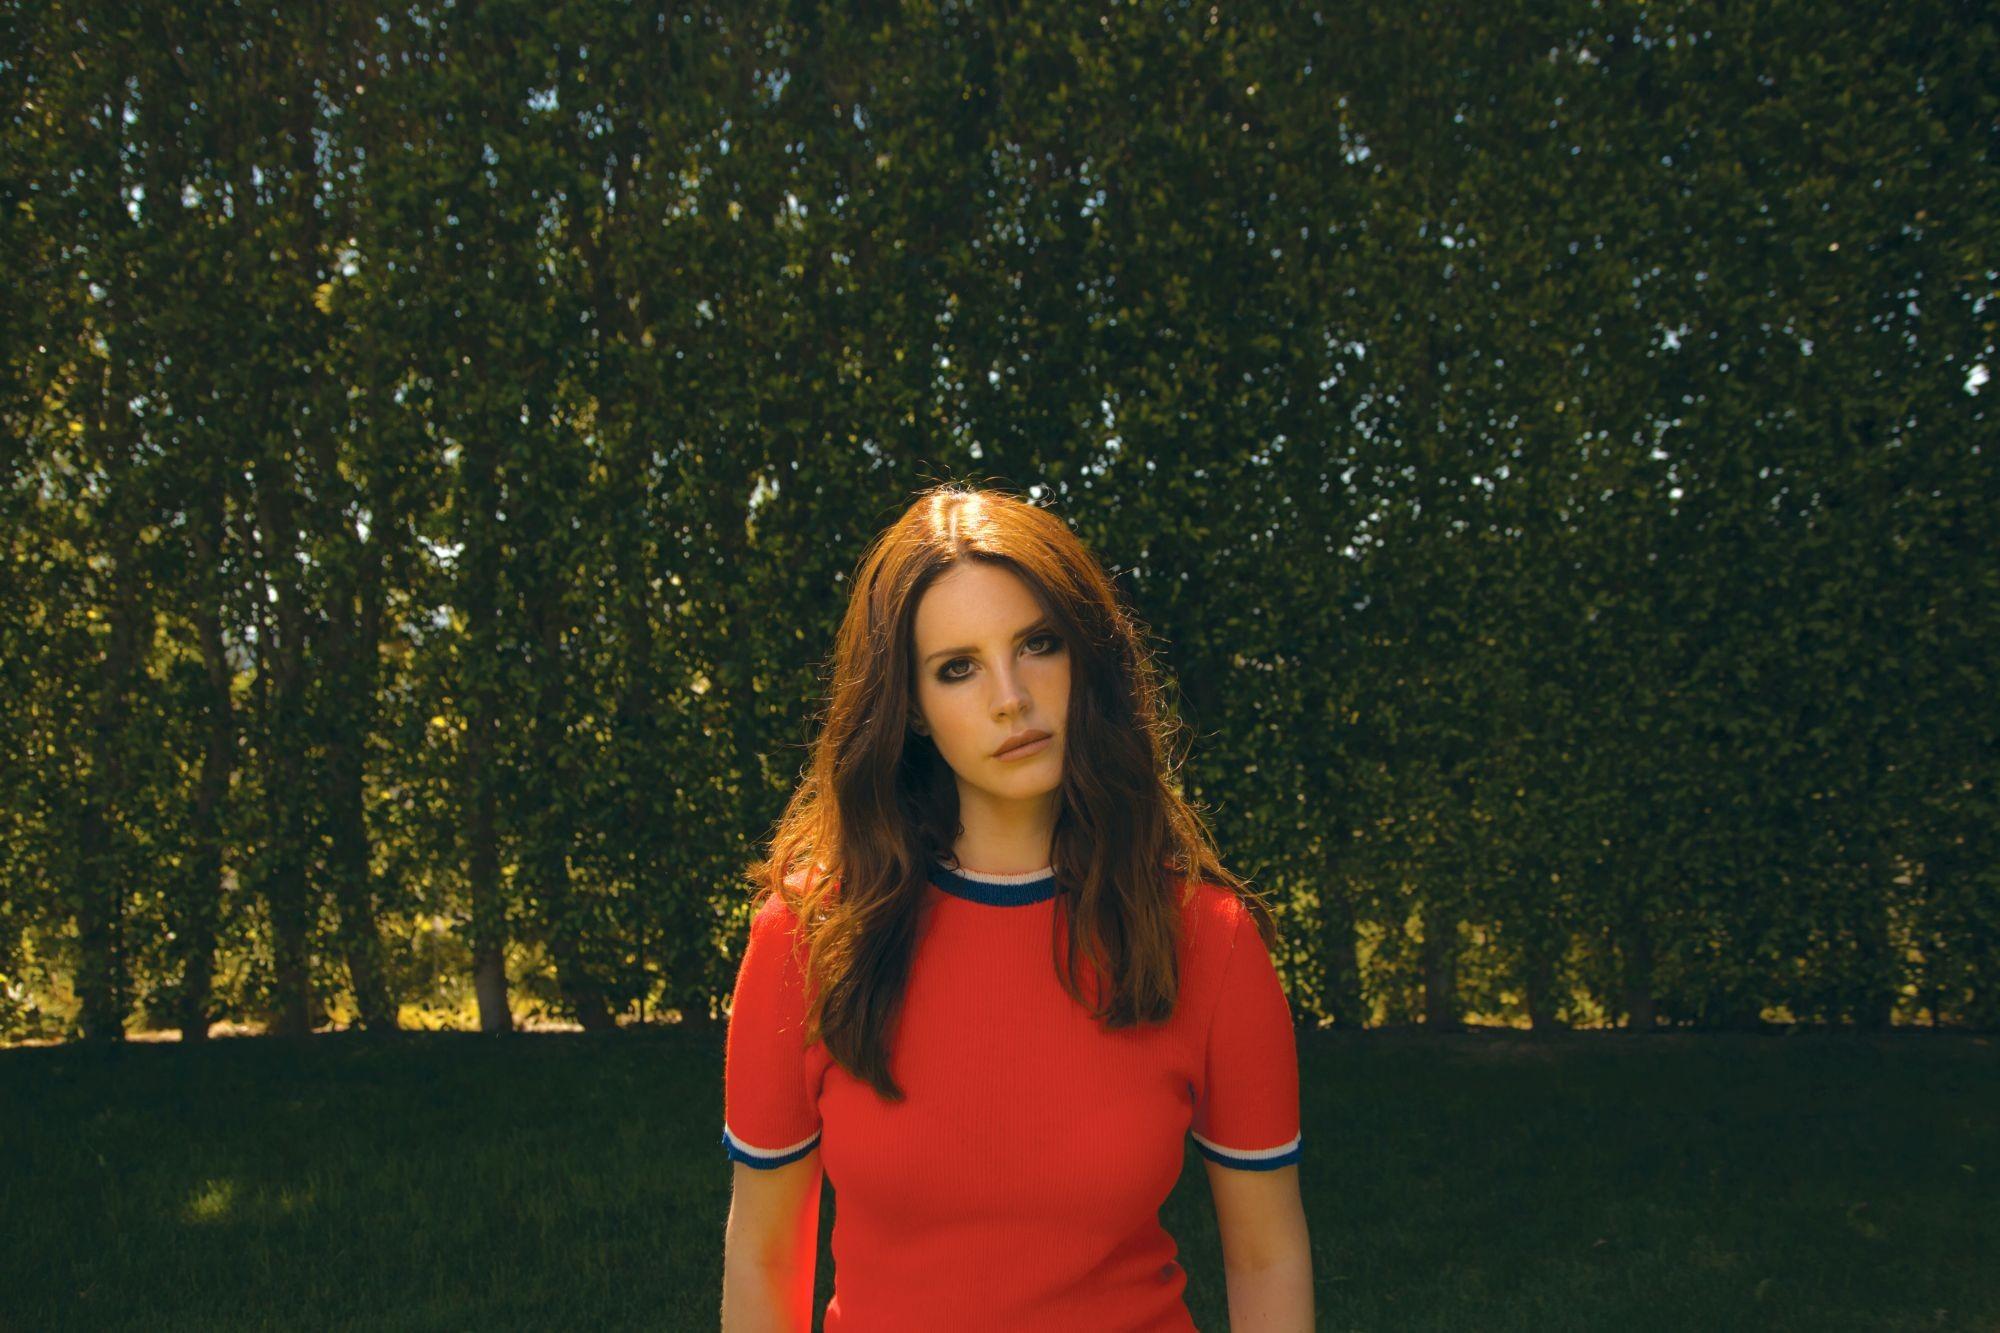 Lana Del Rey Wallpapers 76 Pictures